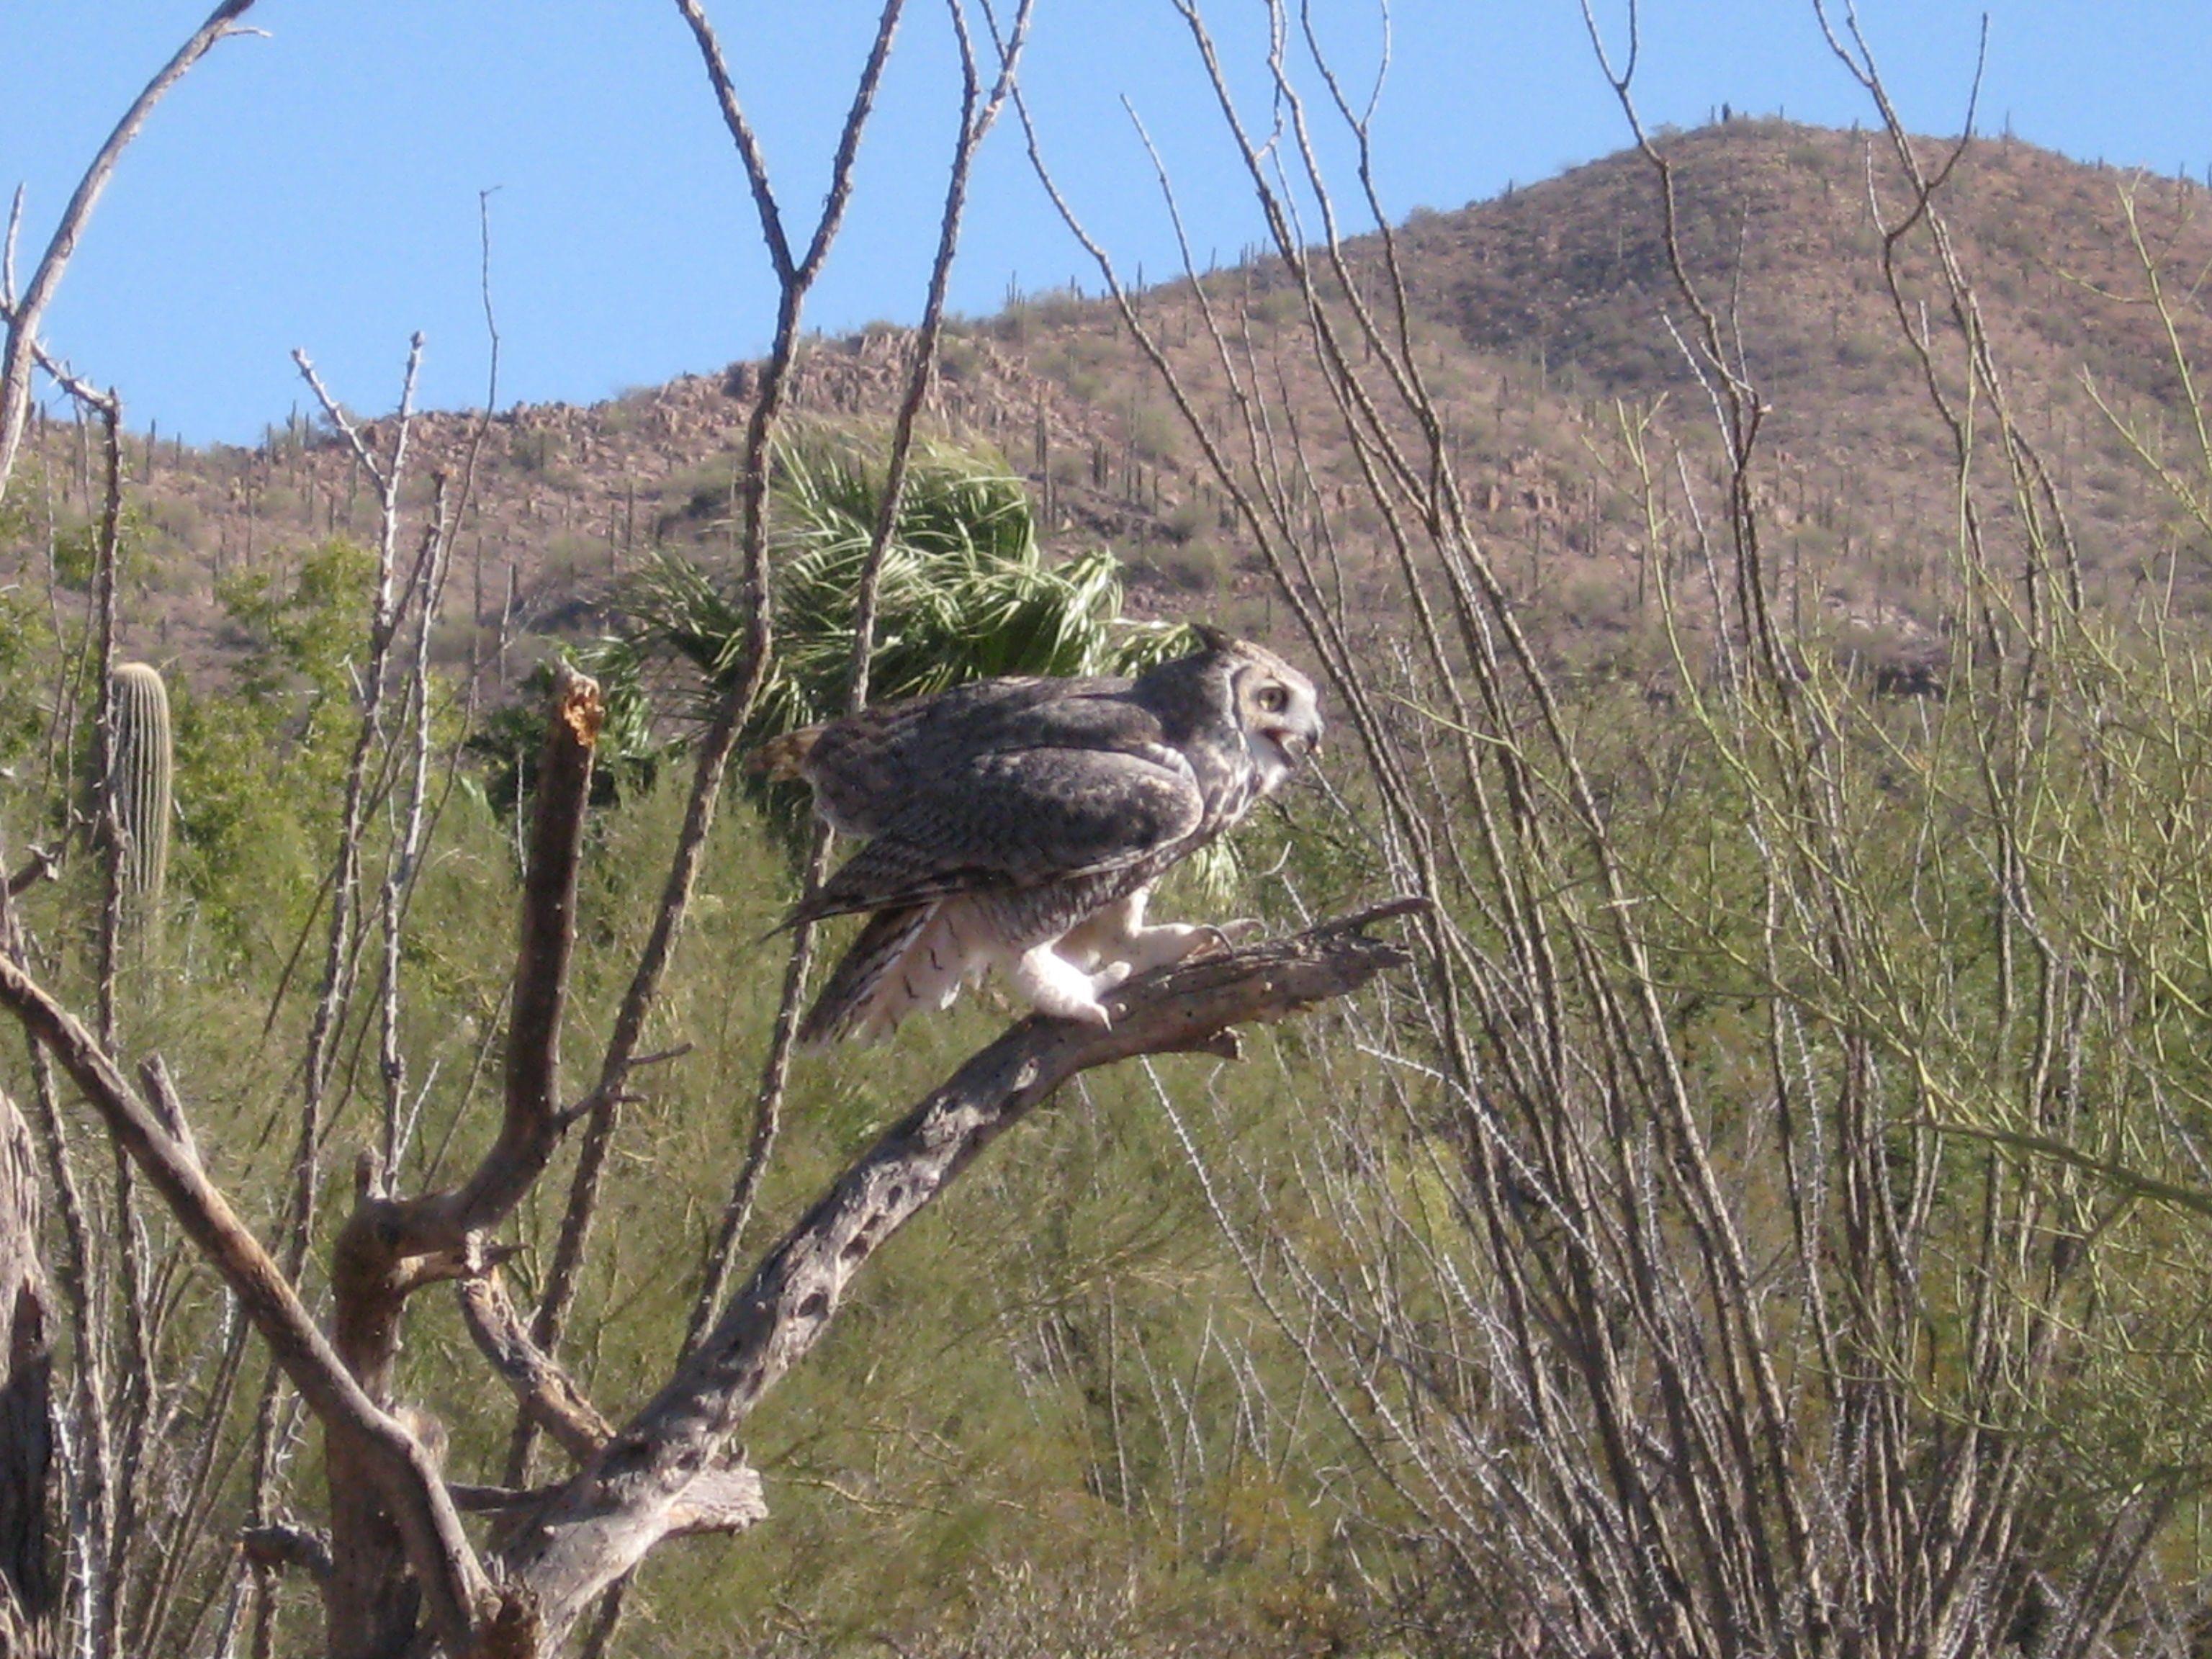 Horned Owl at Arizona Sonora Desert Museum. Sandra Farris Photograph.